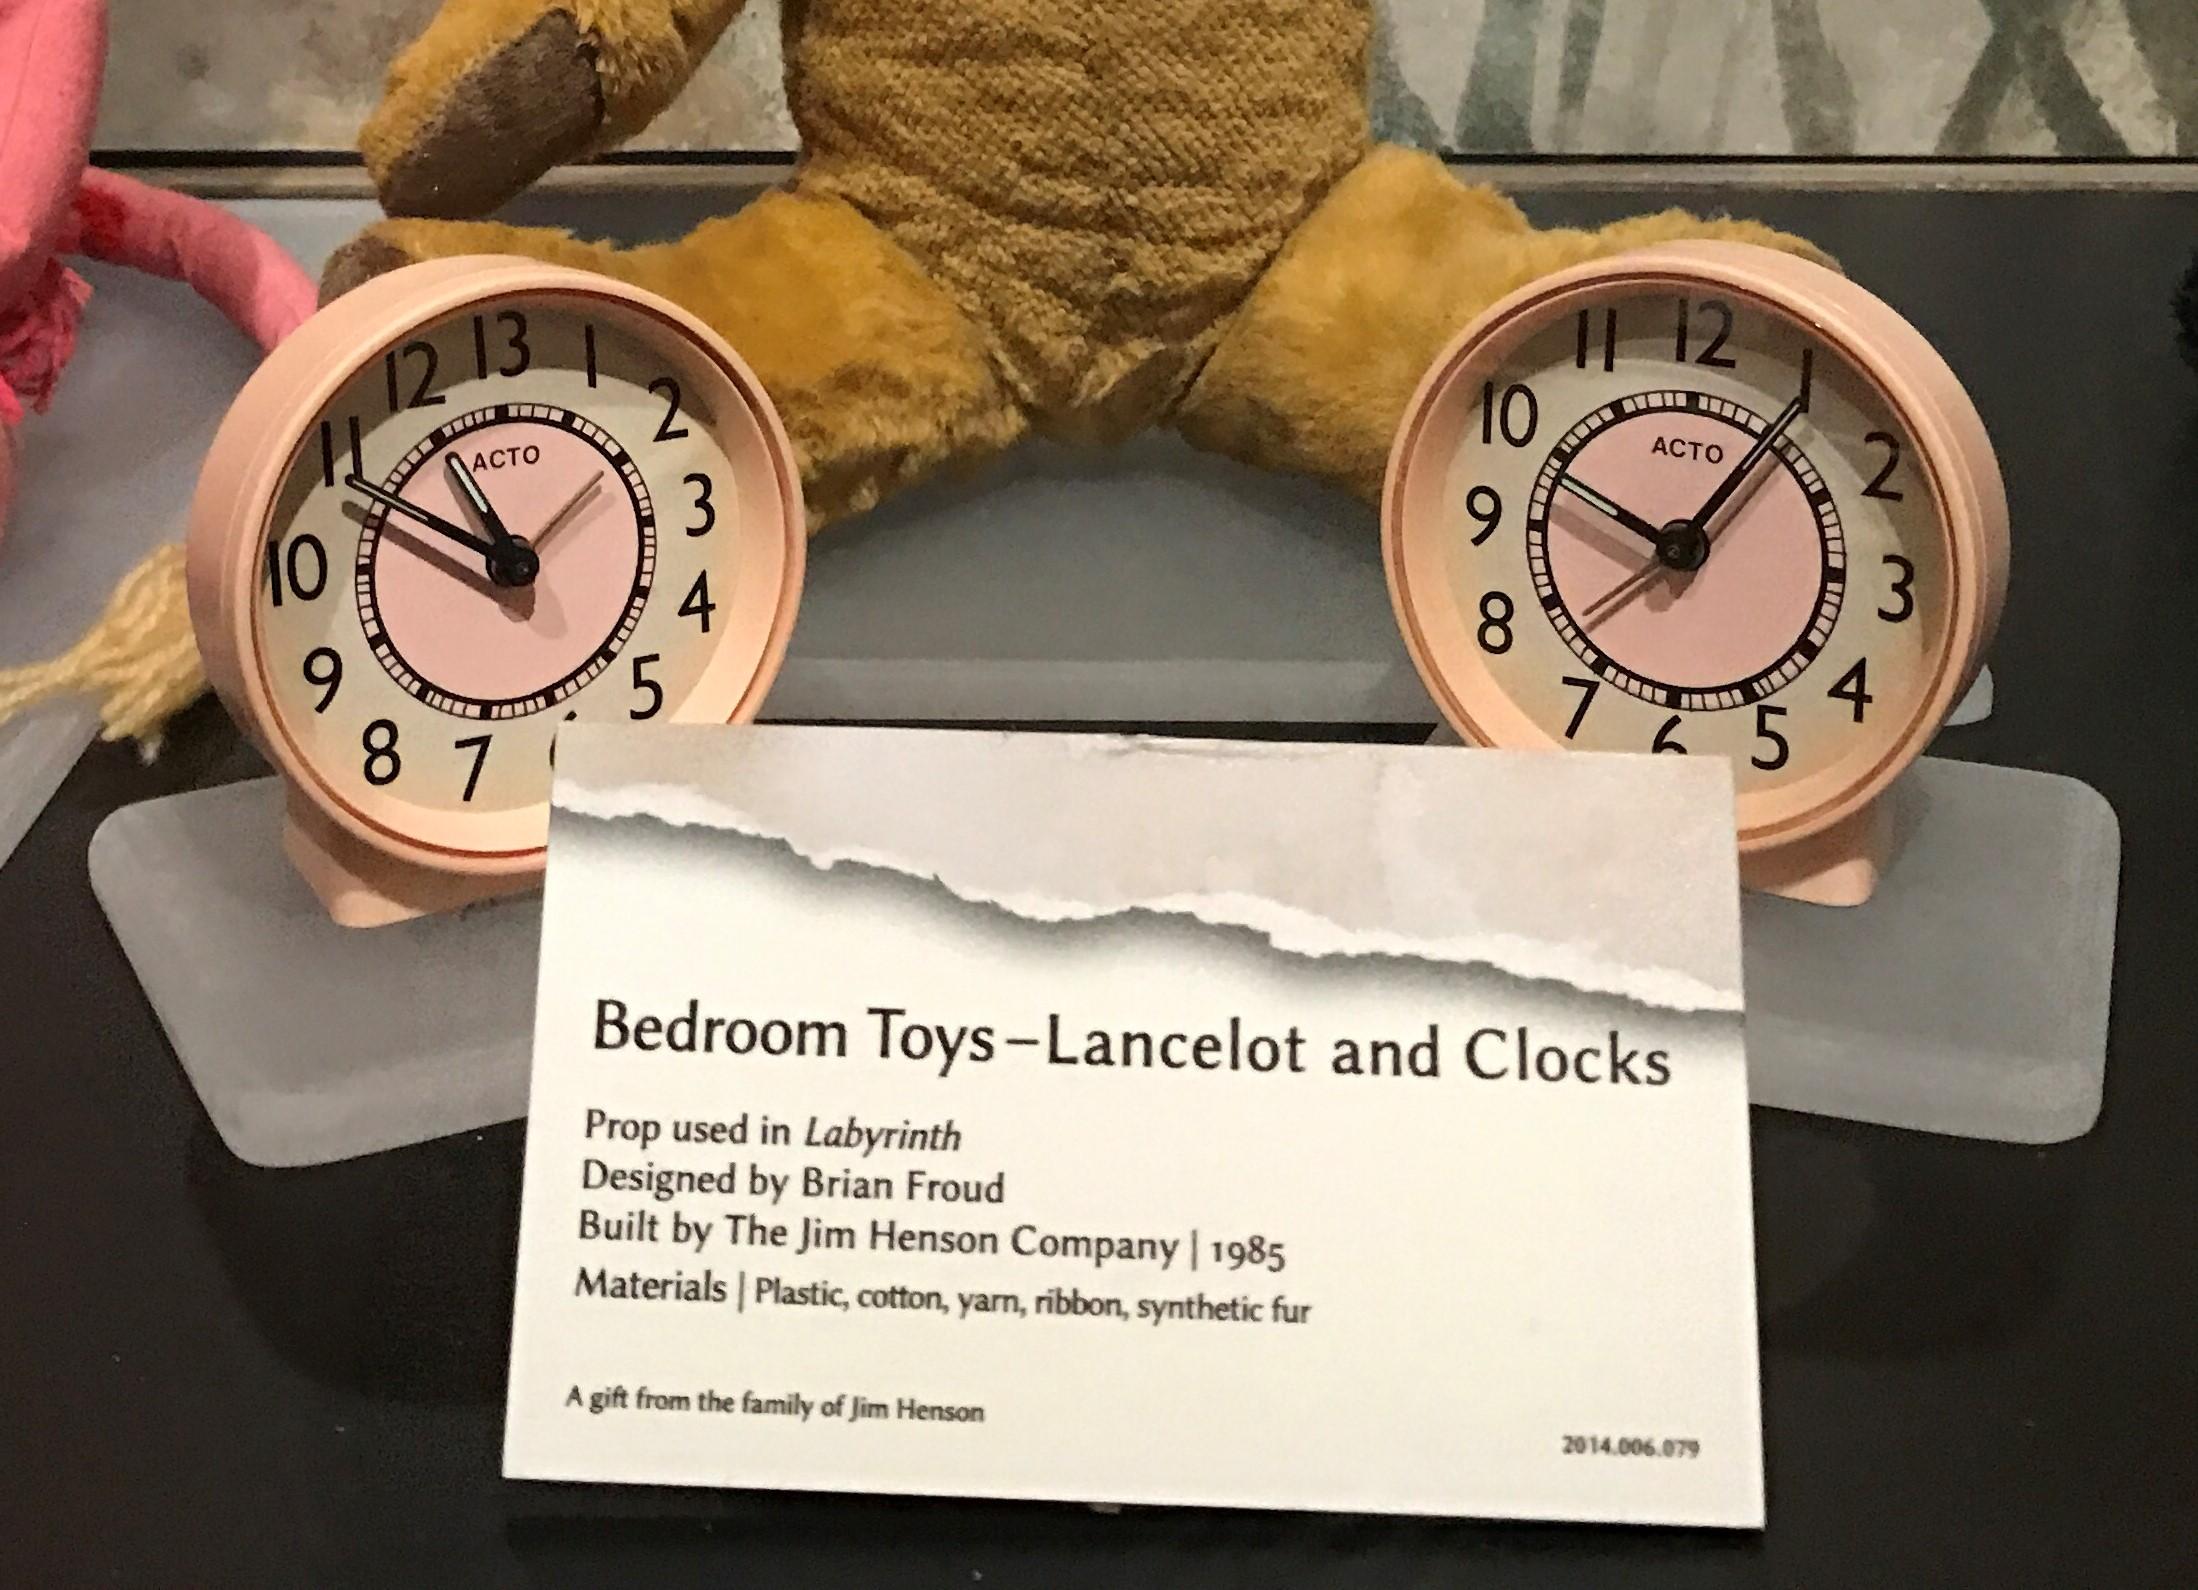 CRAFT: 13 Hour Alarm Clock (Jim Henson's Labyrinth